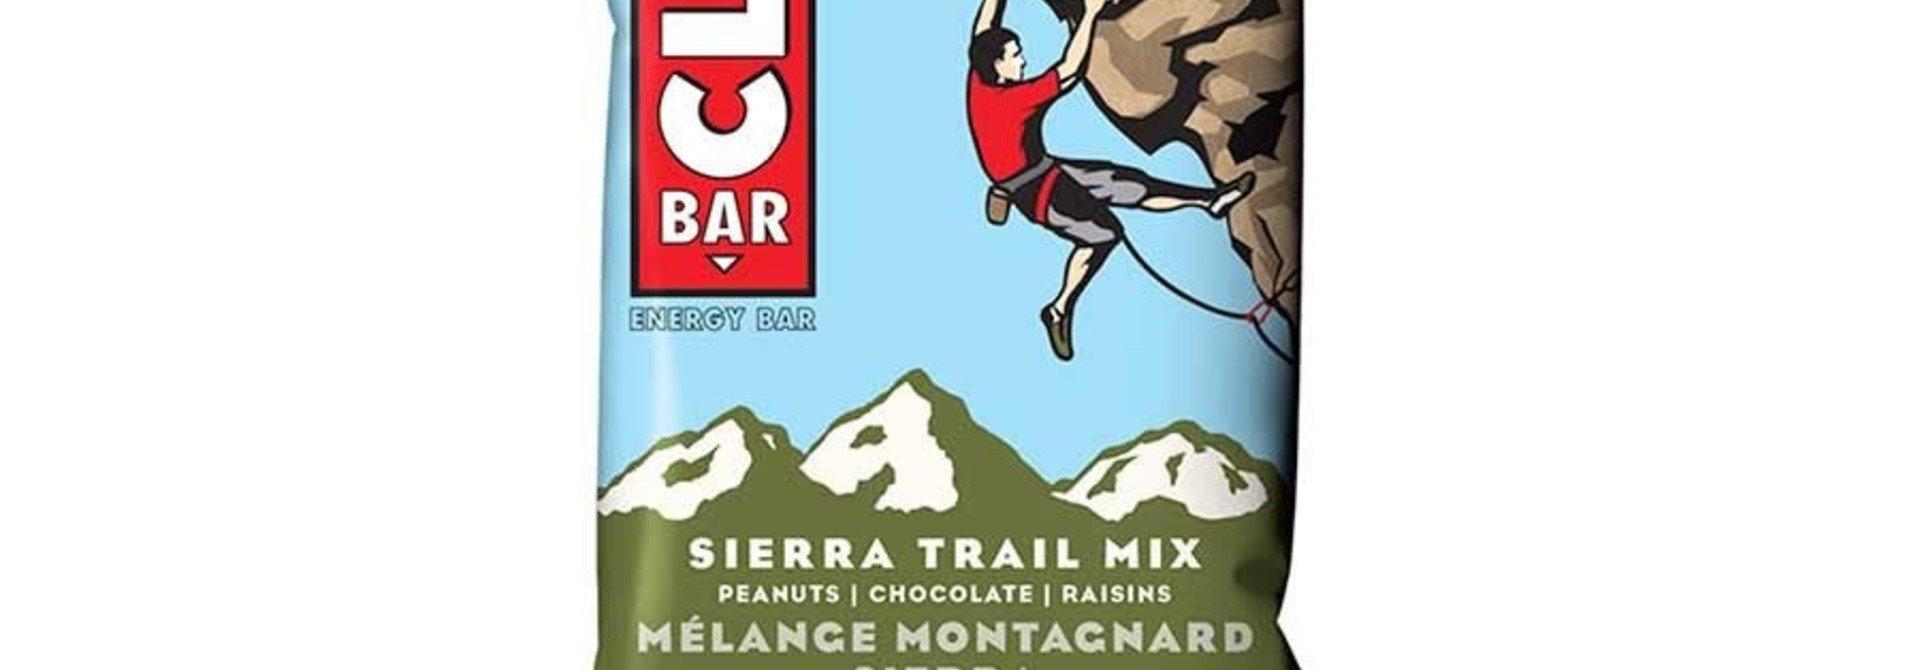 Clif, Energy bars, Sierra Trail Mix